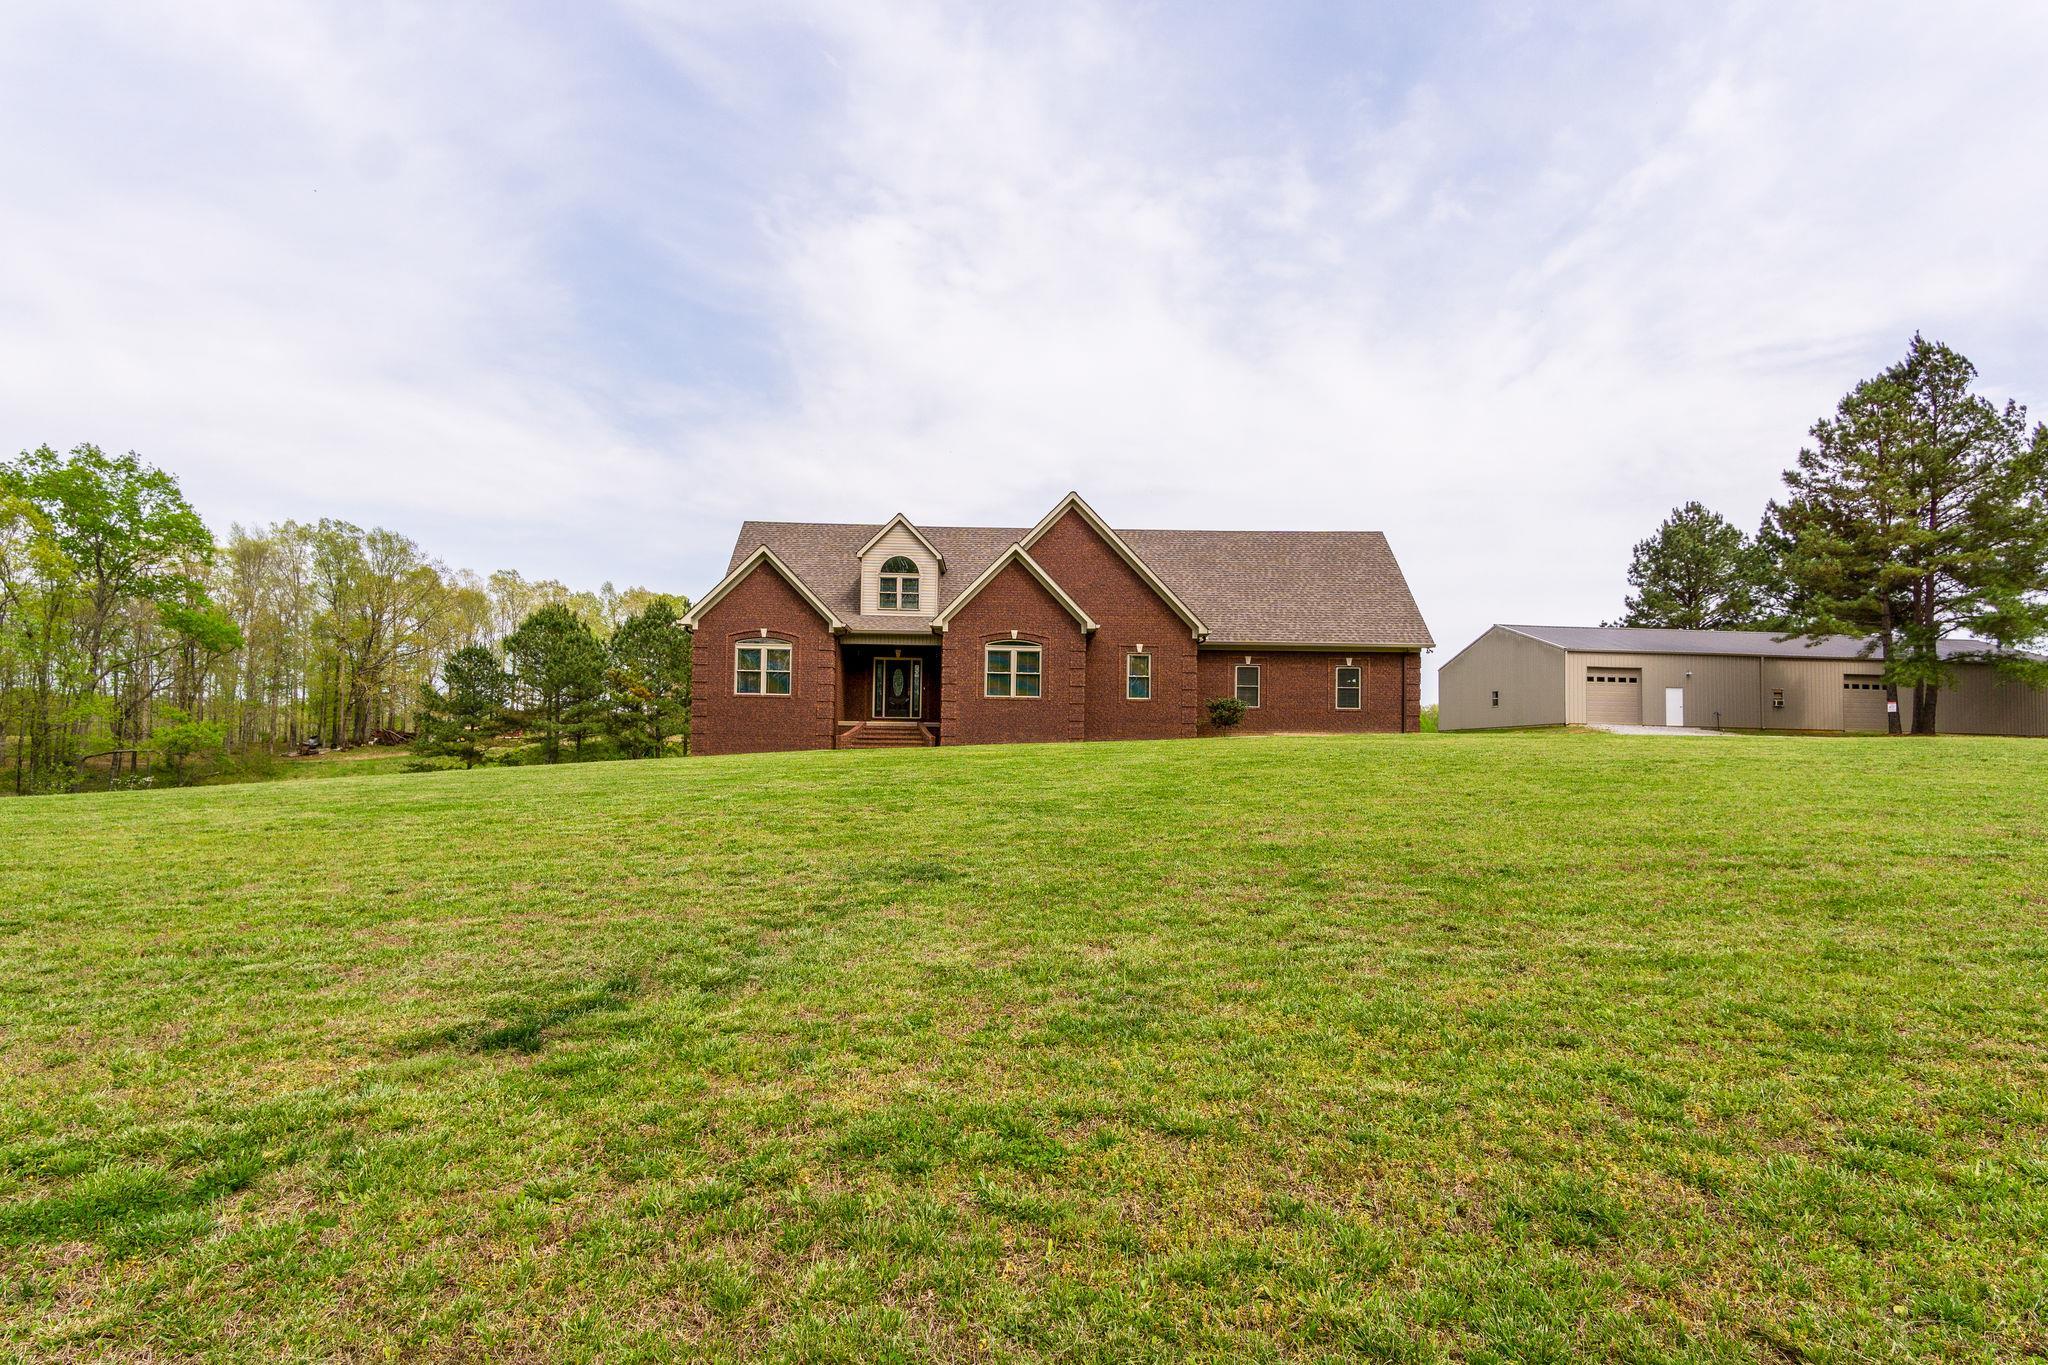 32 Hollis Hollow Rd, Loretto, TN 38469 - Loretto, TN real estate listing